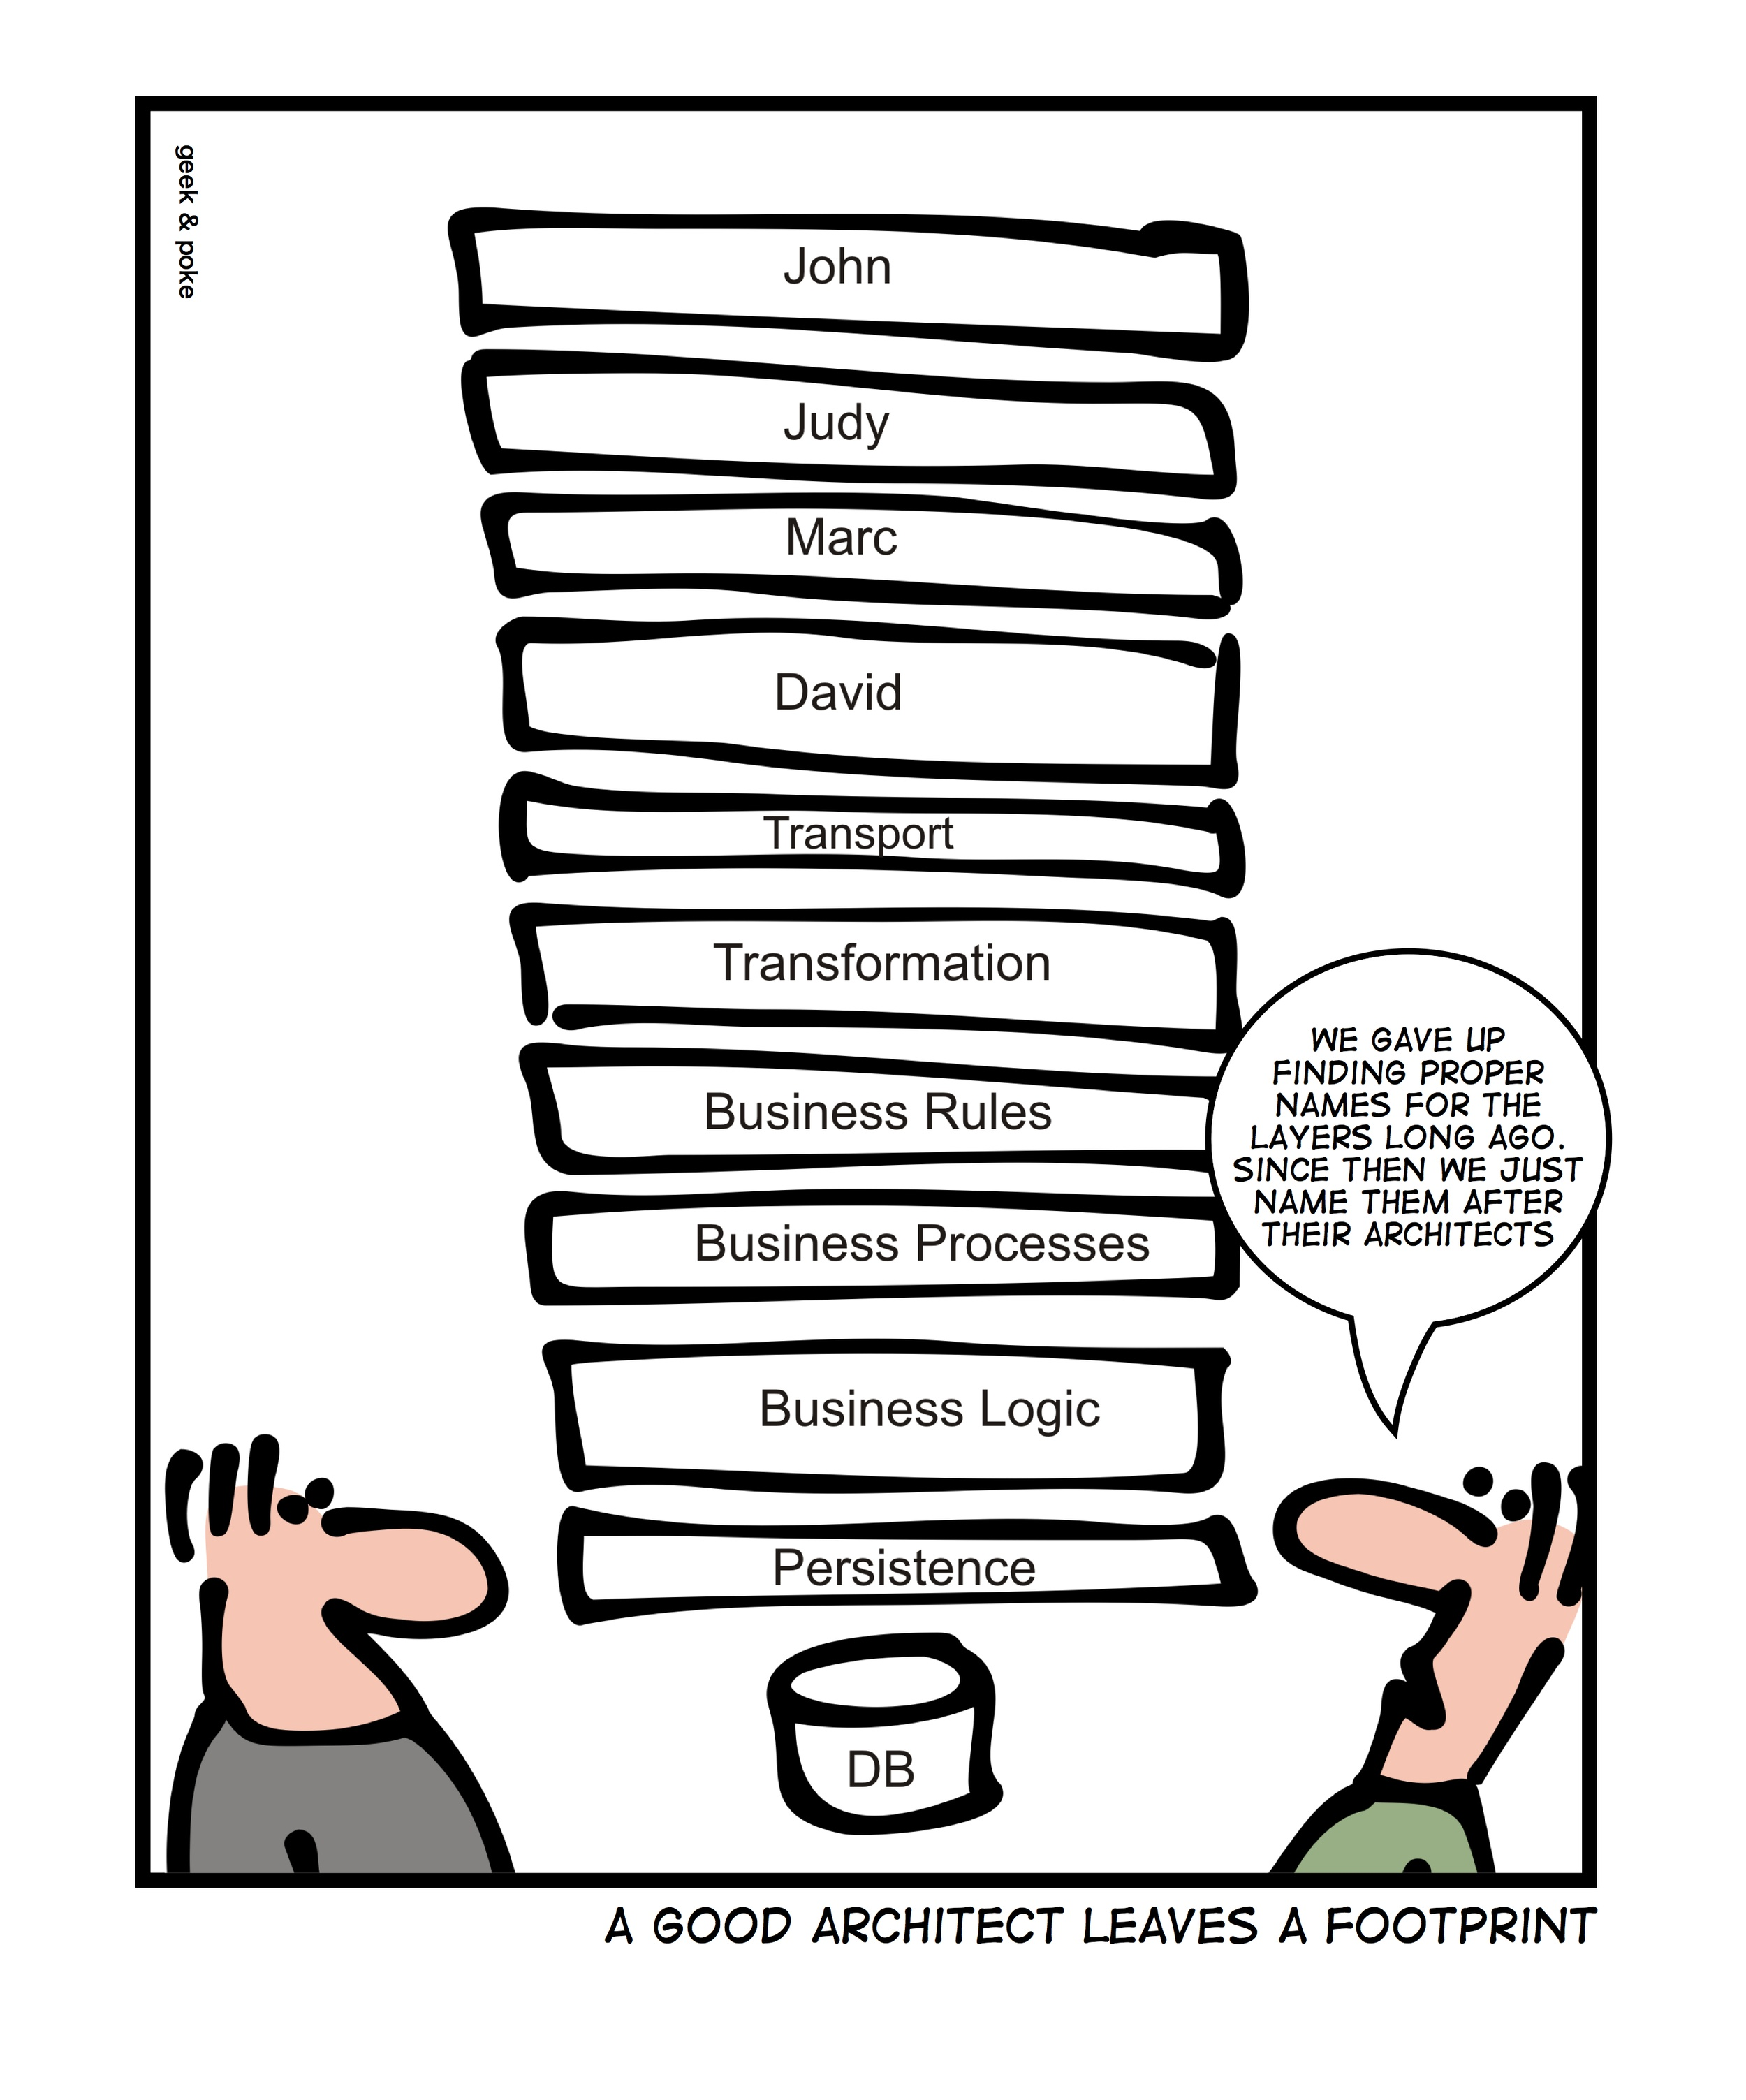 enterprise architecture joke